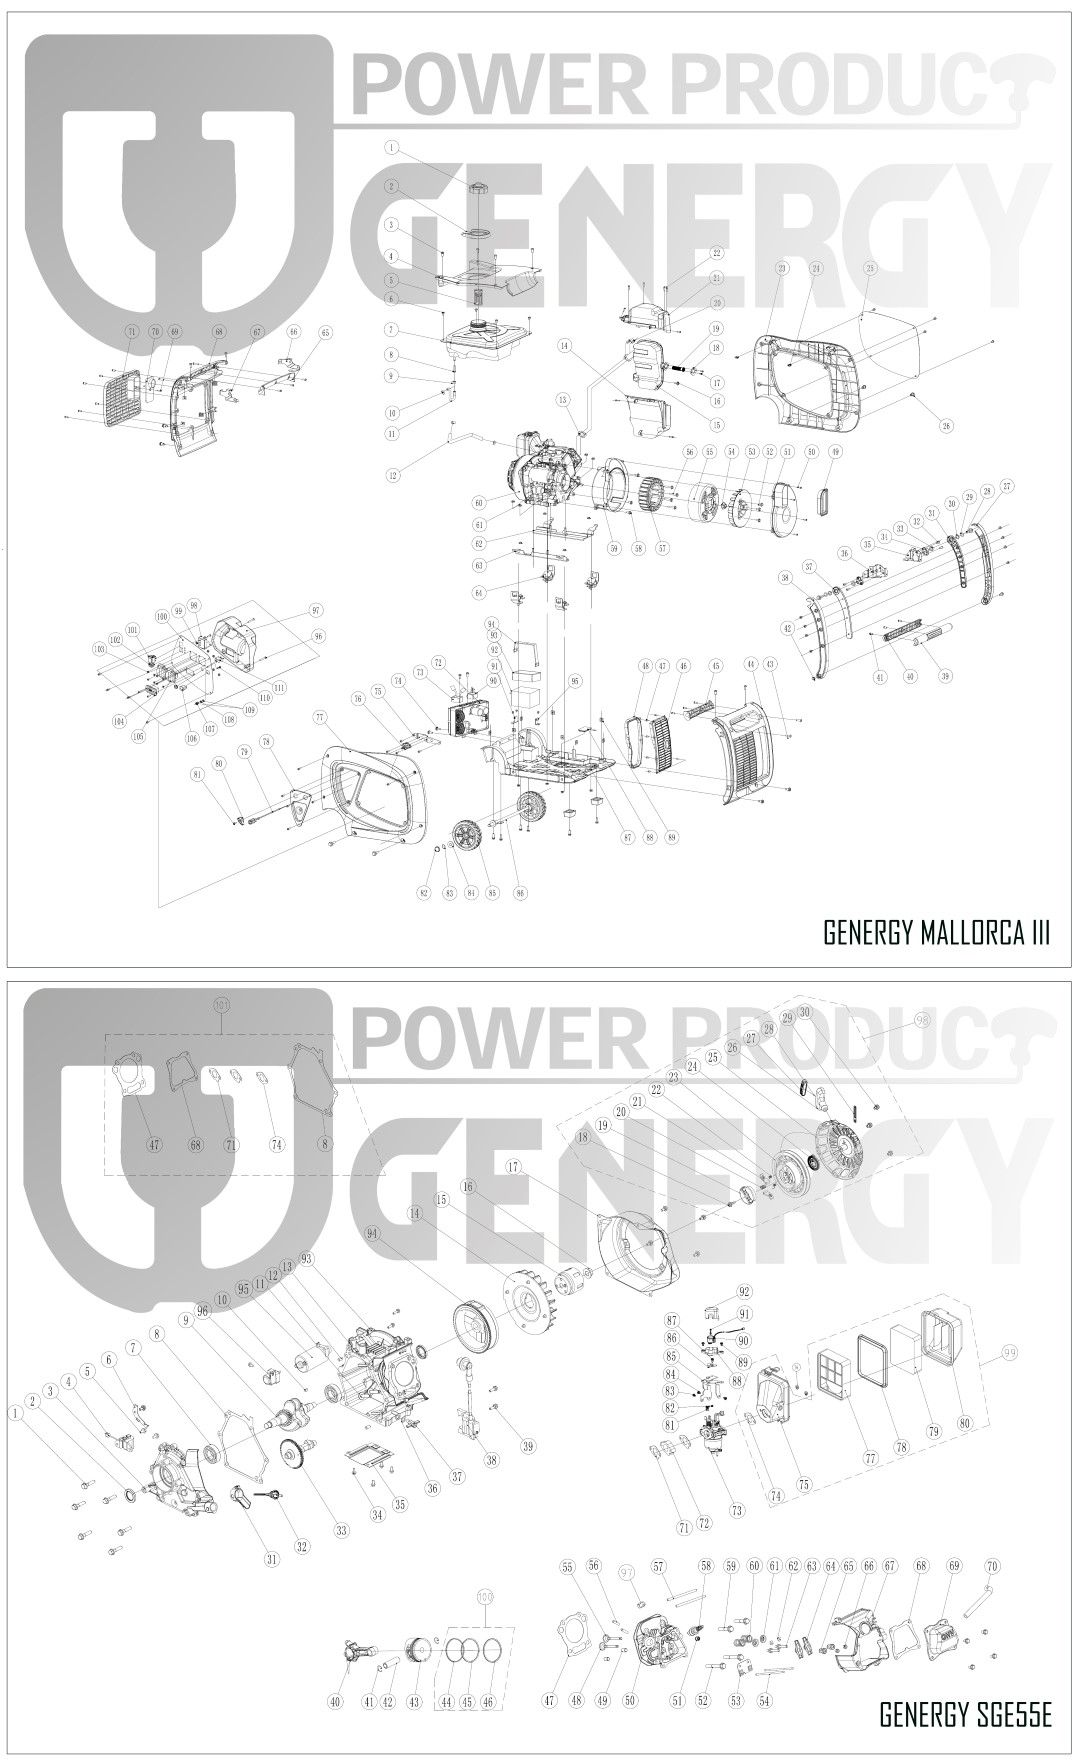 Explosion Generador Inverter Mallorca III